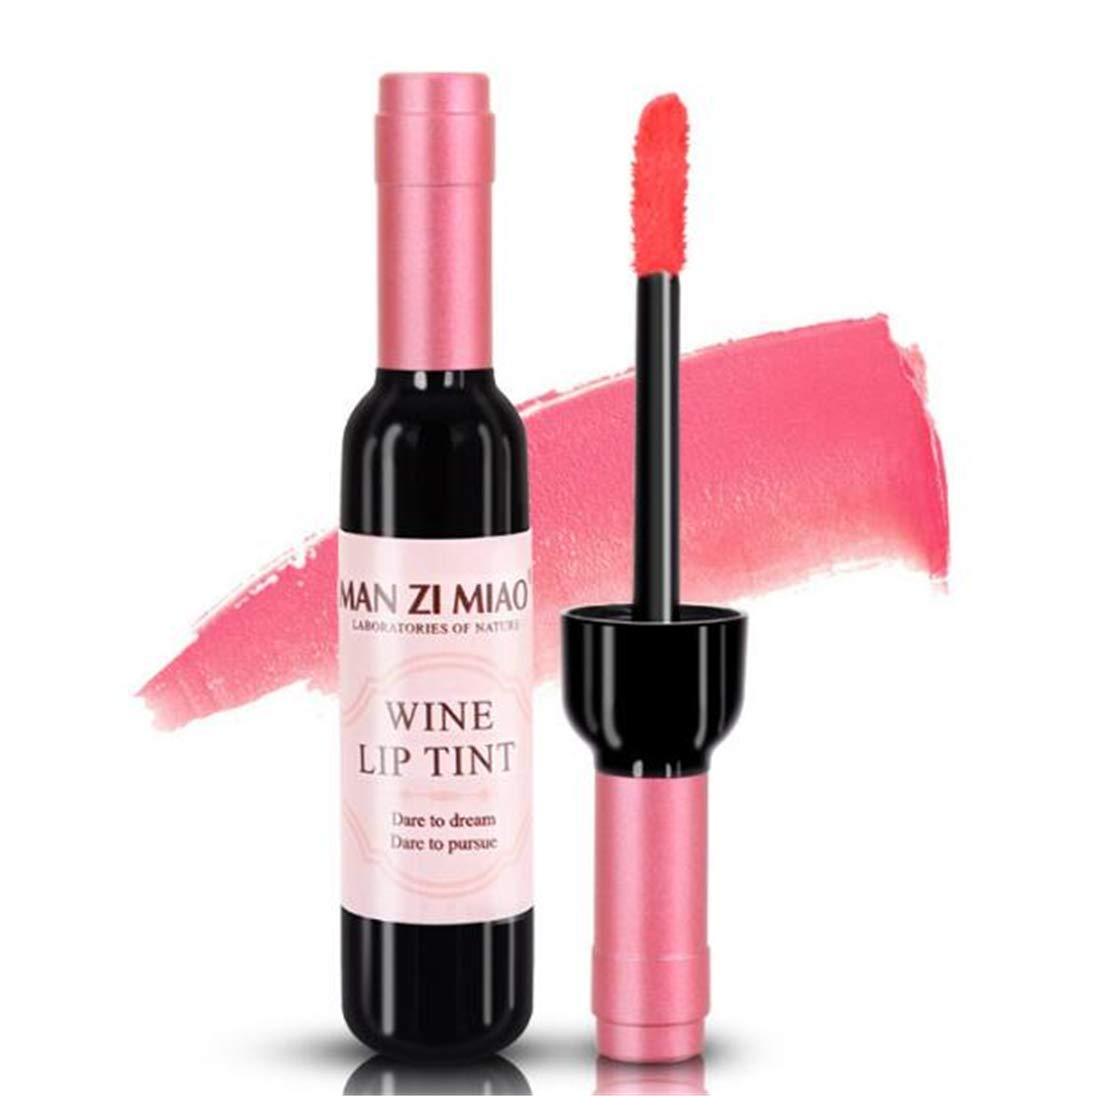 Tmrow 1PC Wine Liquid Lipstick Lady Long Lasting Make Up Gloss Matte Lip Sticks Wine Bottle Cover(Color Sent Randomly)